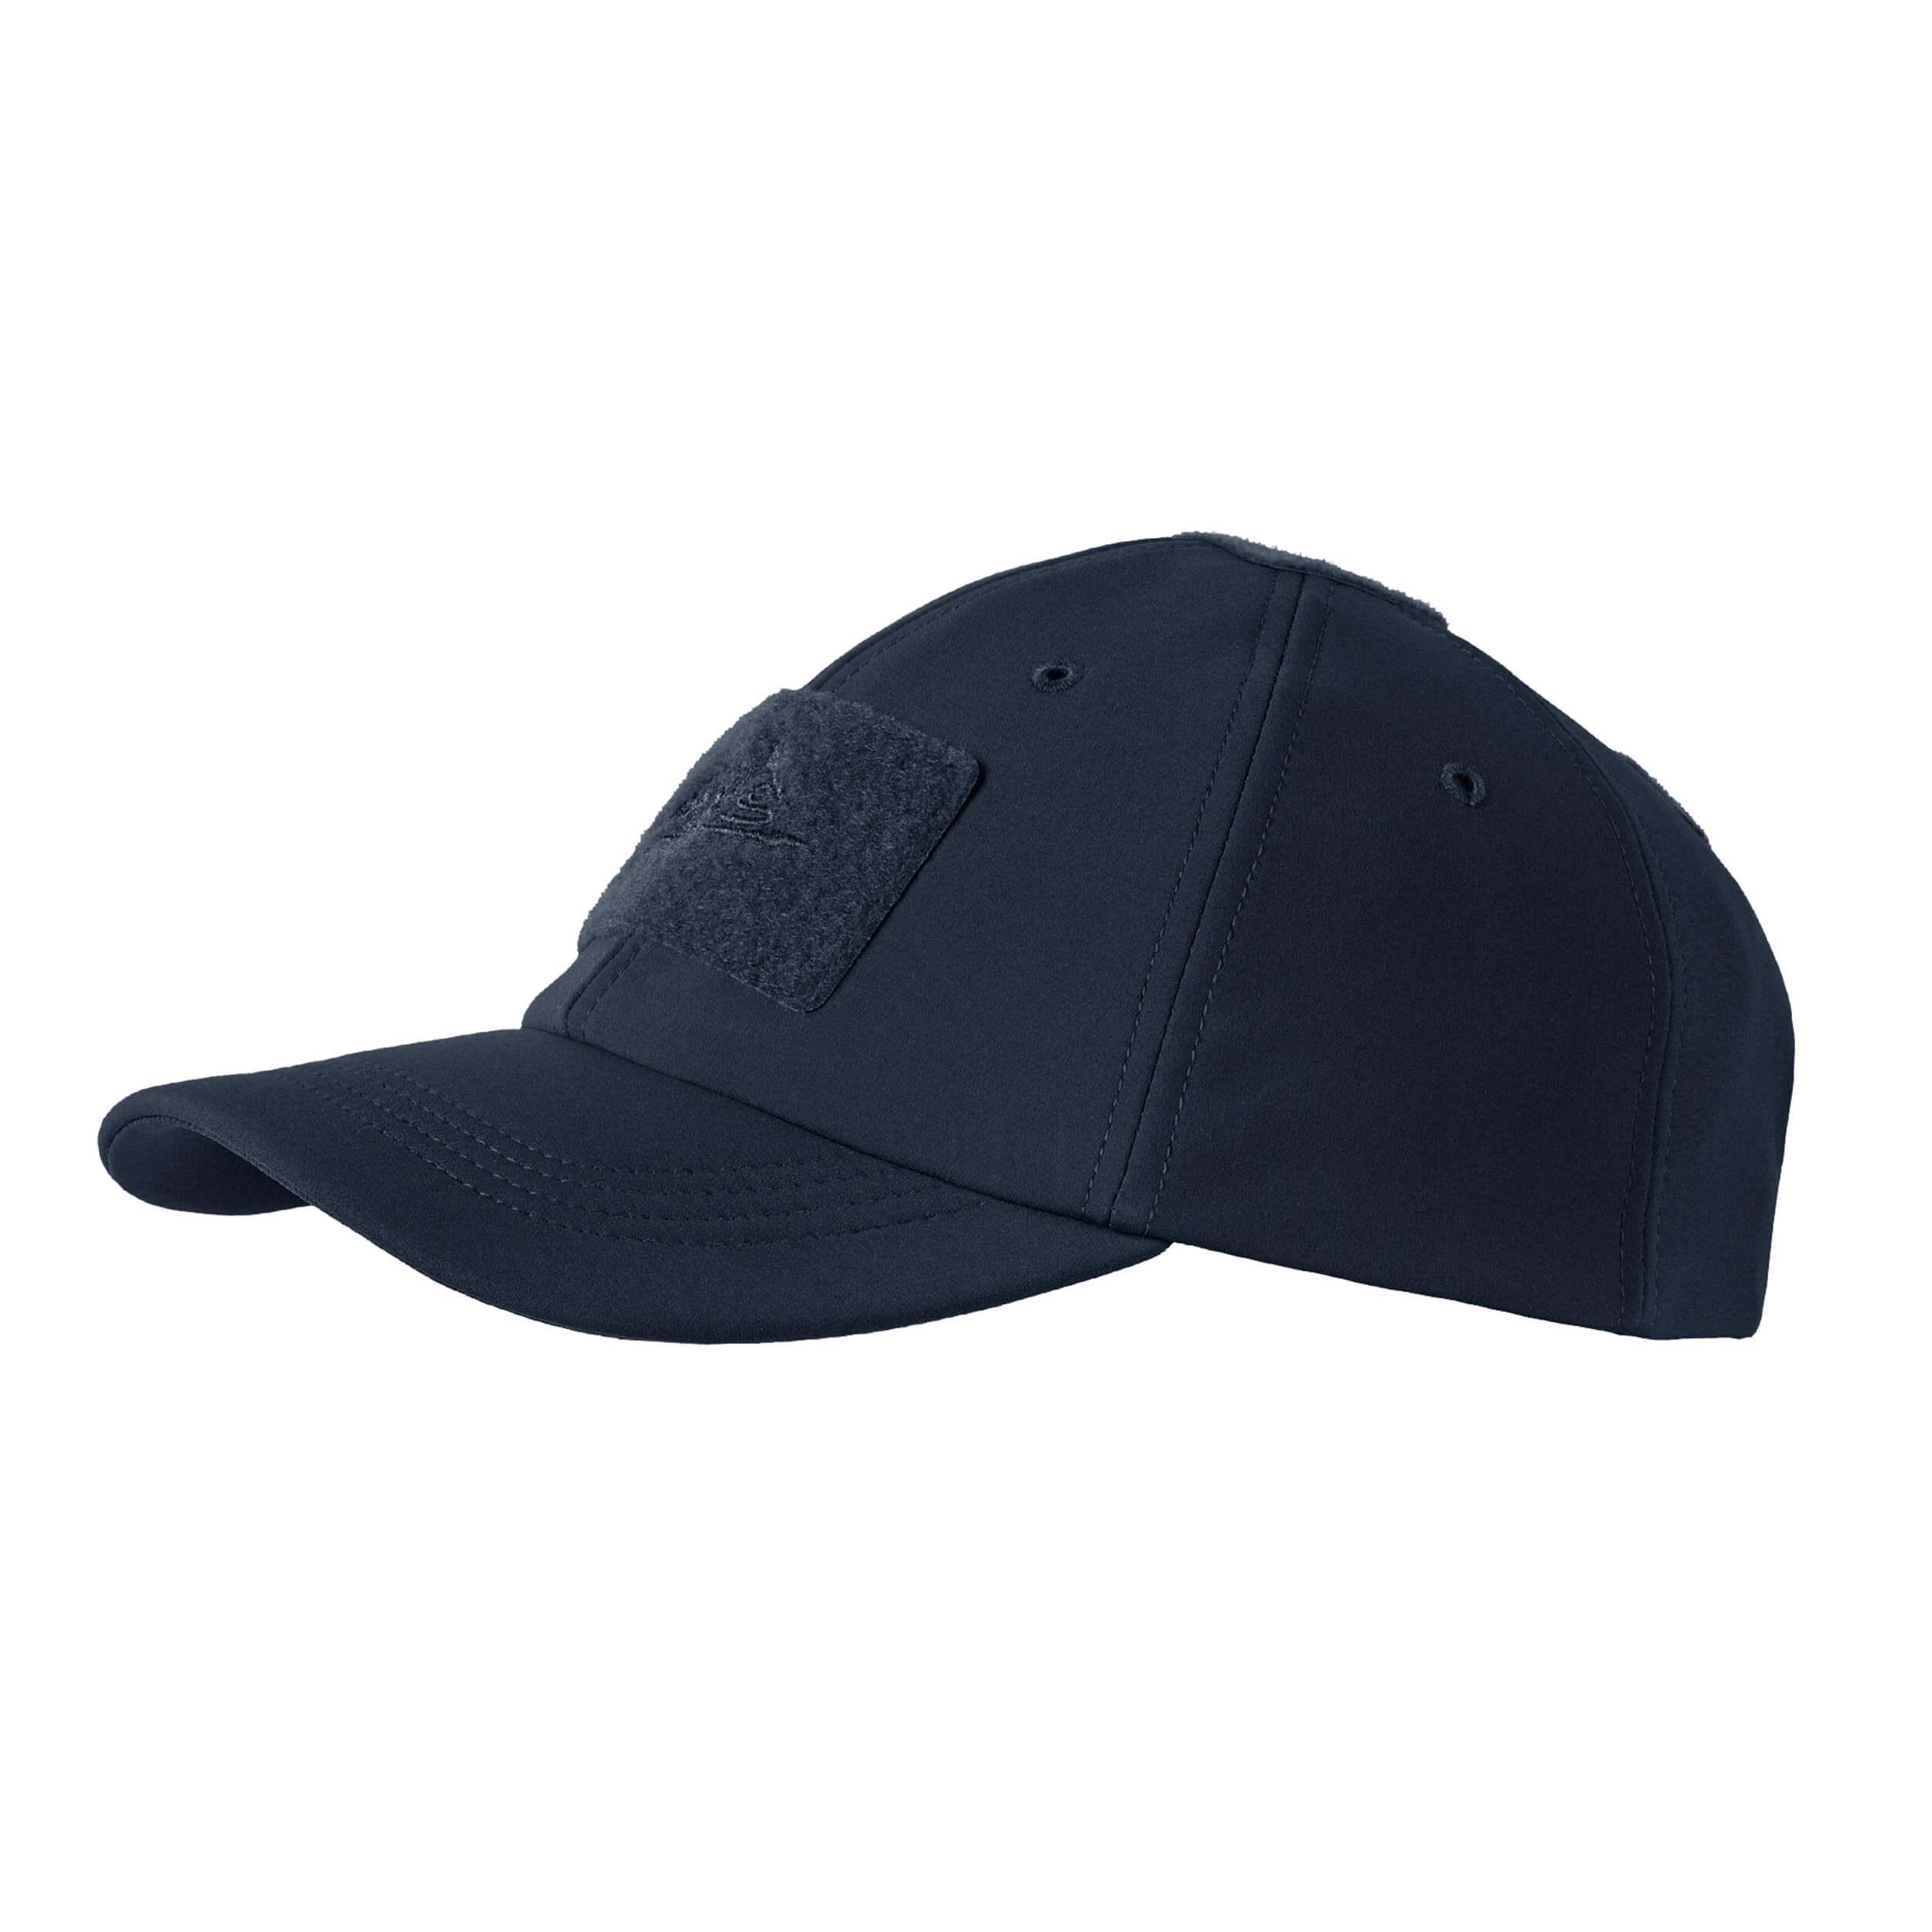 Helikon-Tex BBC Winter Cap -Shark Skin- Navy Blue